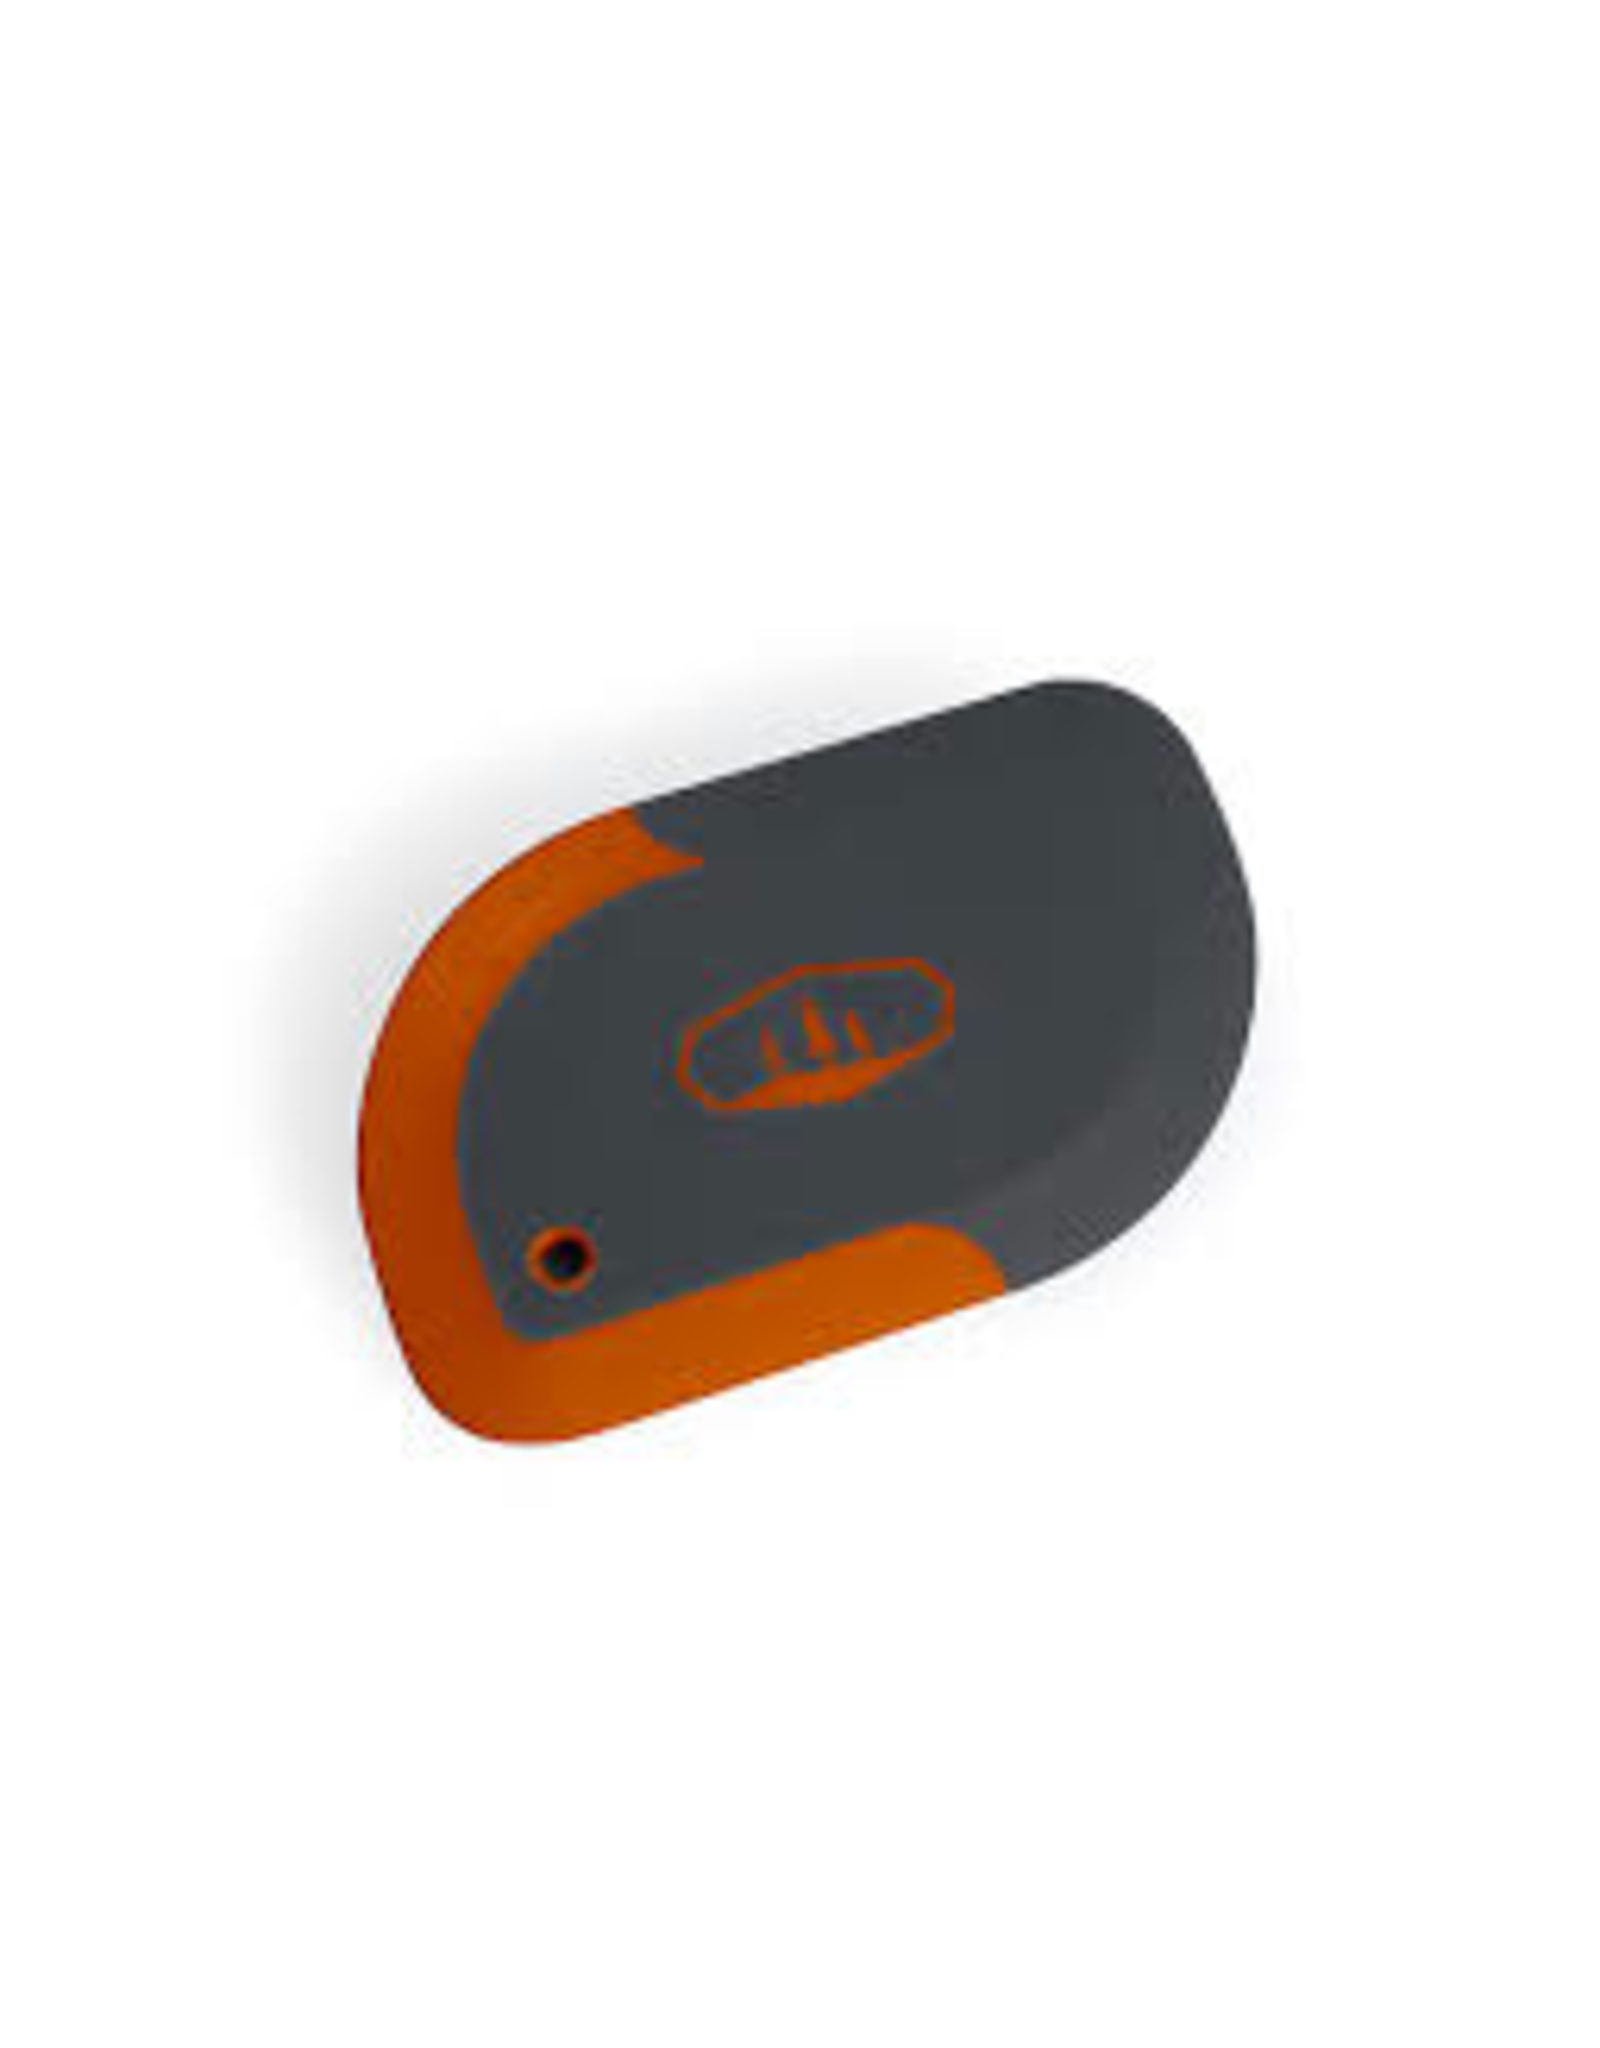 GSI Outdoors GSI Outdoors Compact Pot Scraper